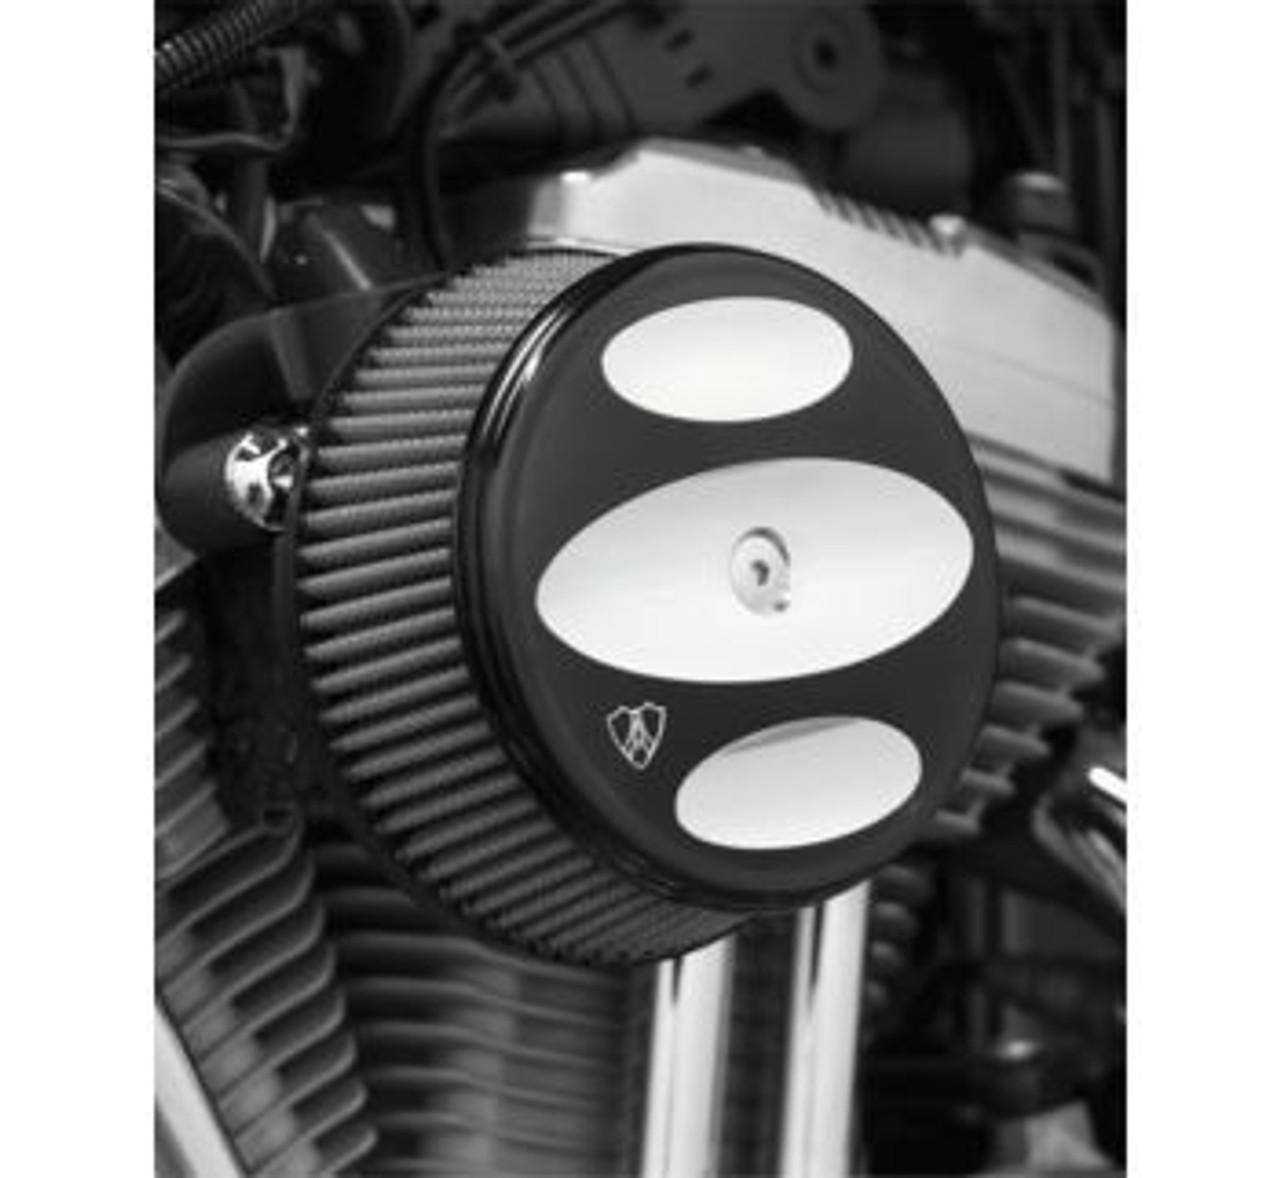 Arlen Ness Black Stage 1 Big Sucker Billet Air Cleaner Cover Harley Davidson